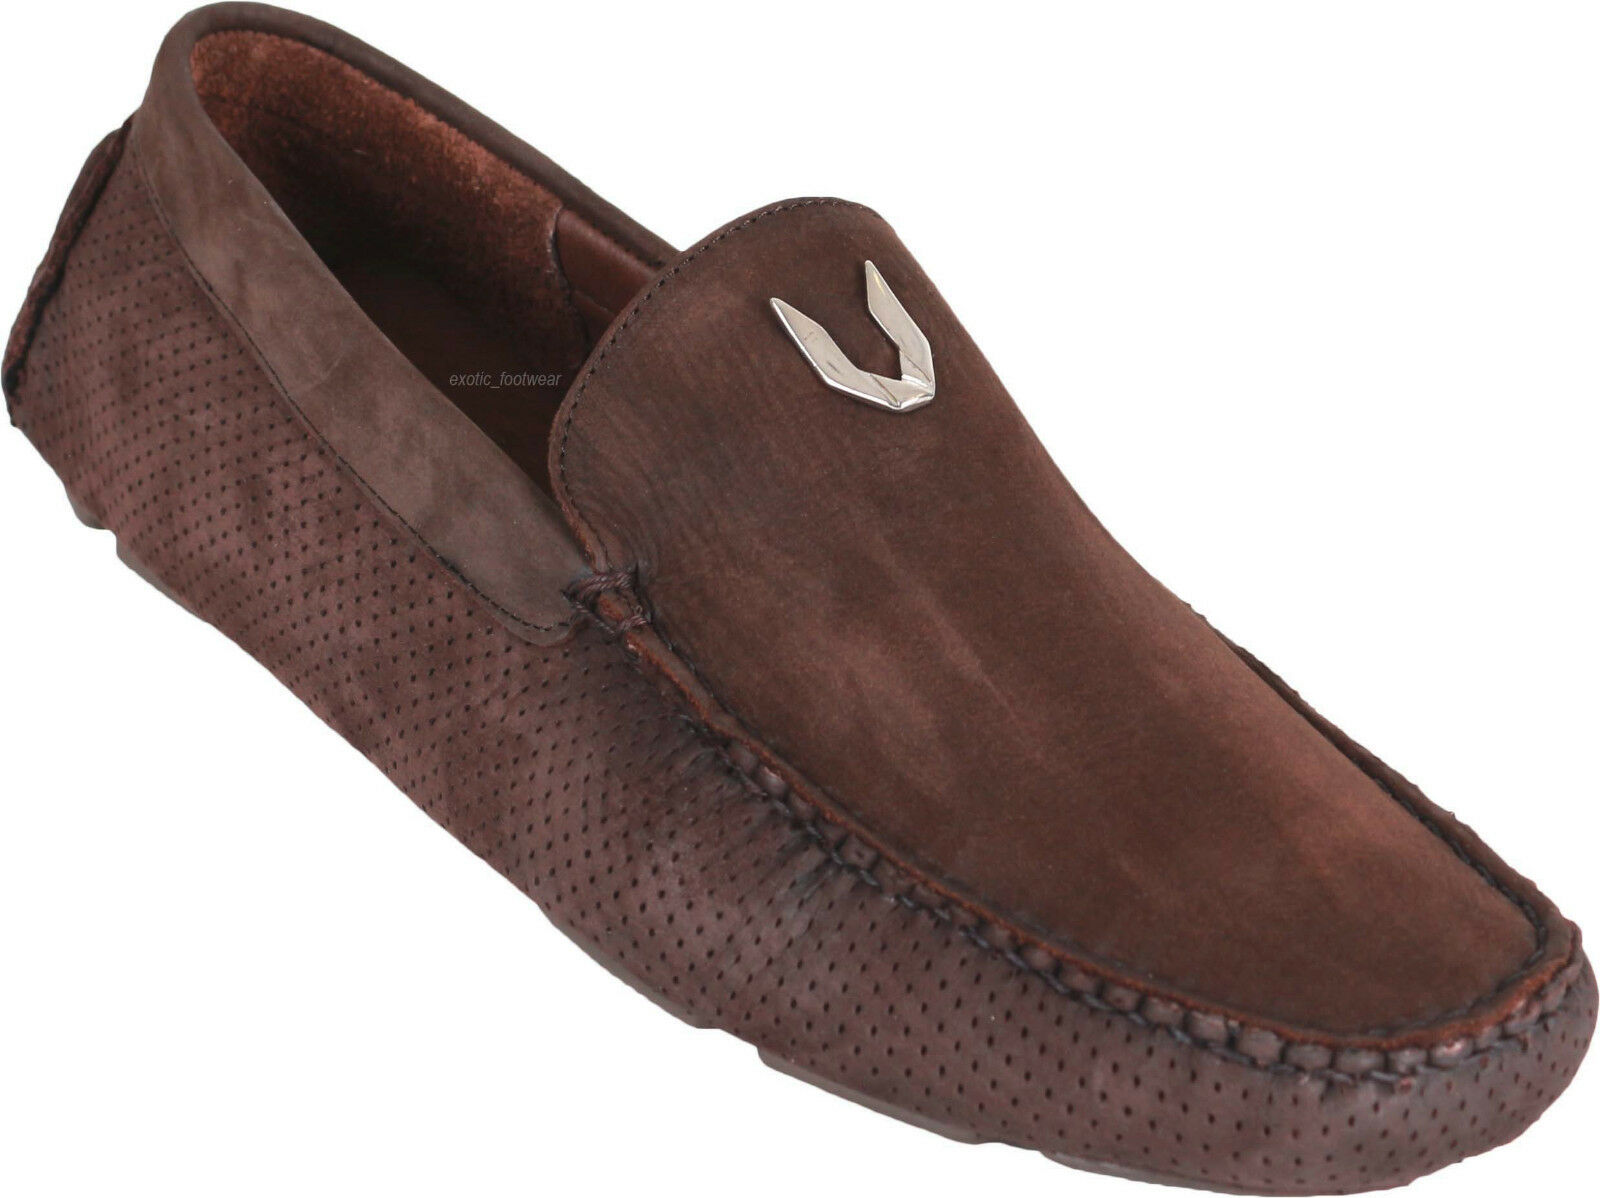 Men's Vestigium Genuine Suede Leather Casual Loafer Slip On shoes Handmade